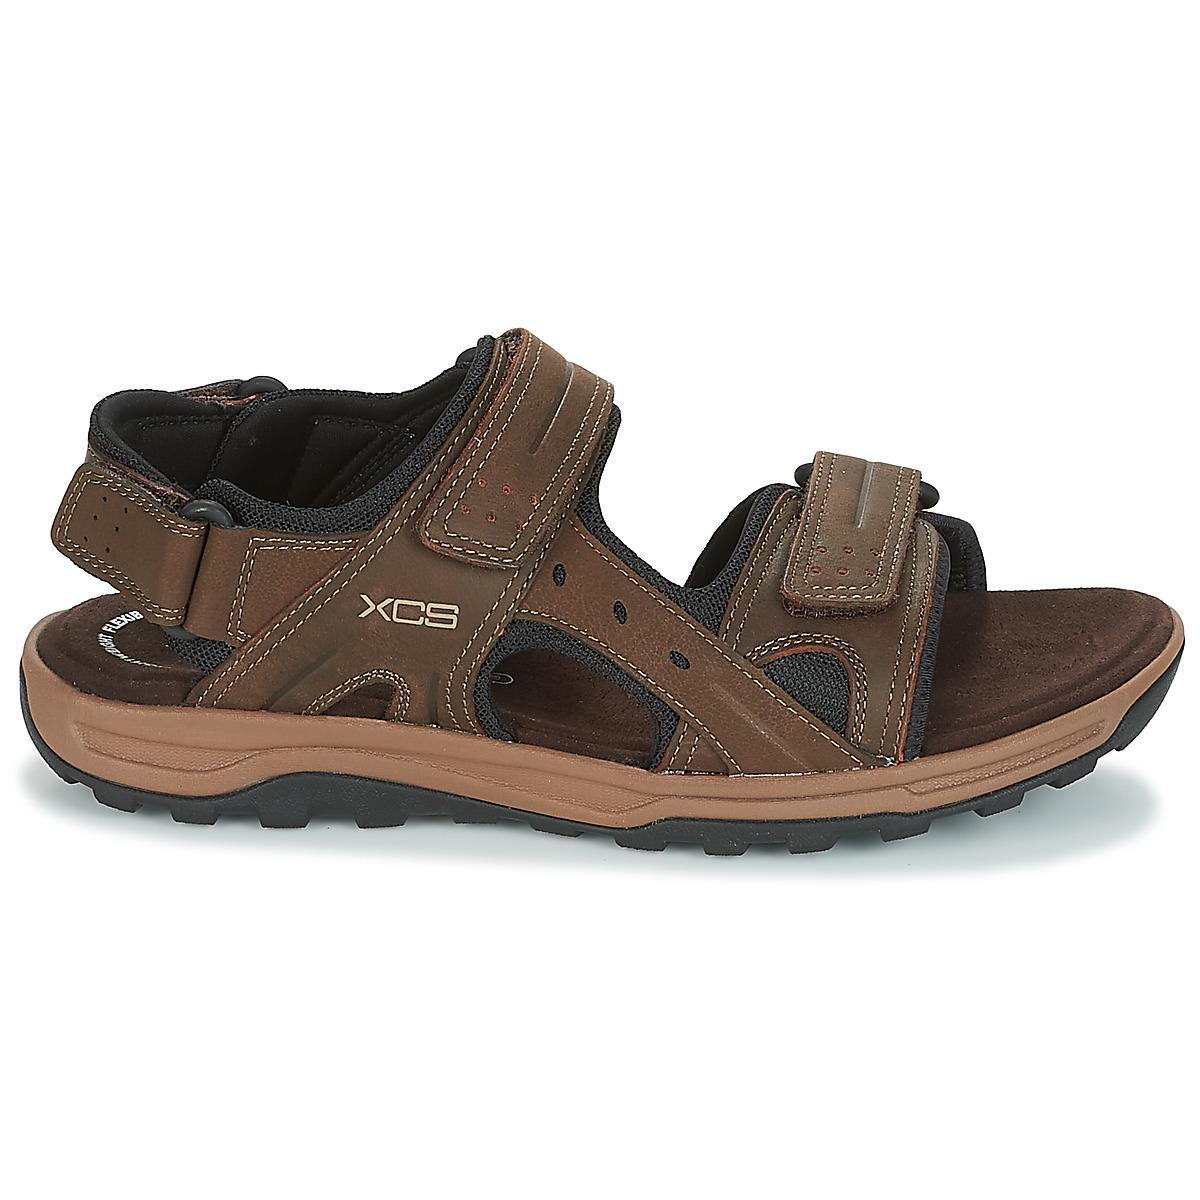 562f61295c1cb Rockport Tt Velcro Sandal Men s Sandals In Brown in Brown for Men - Lyst